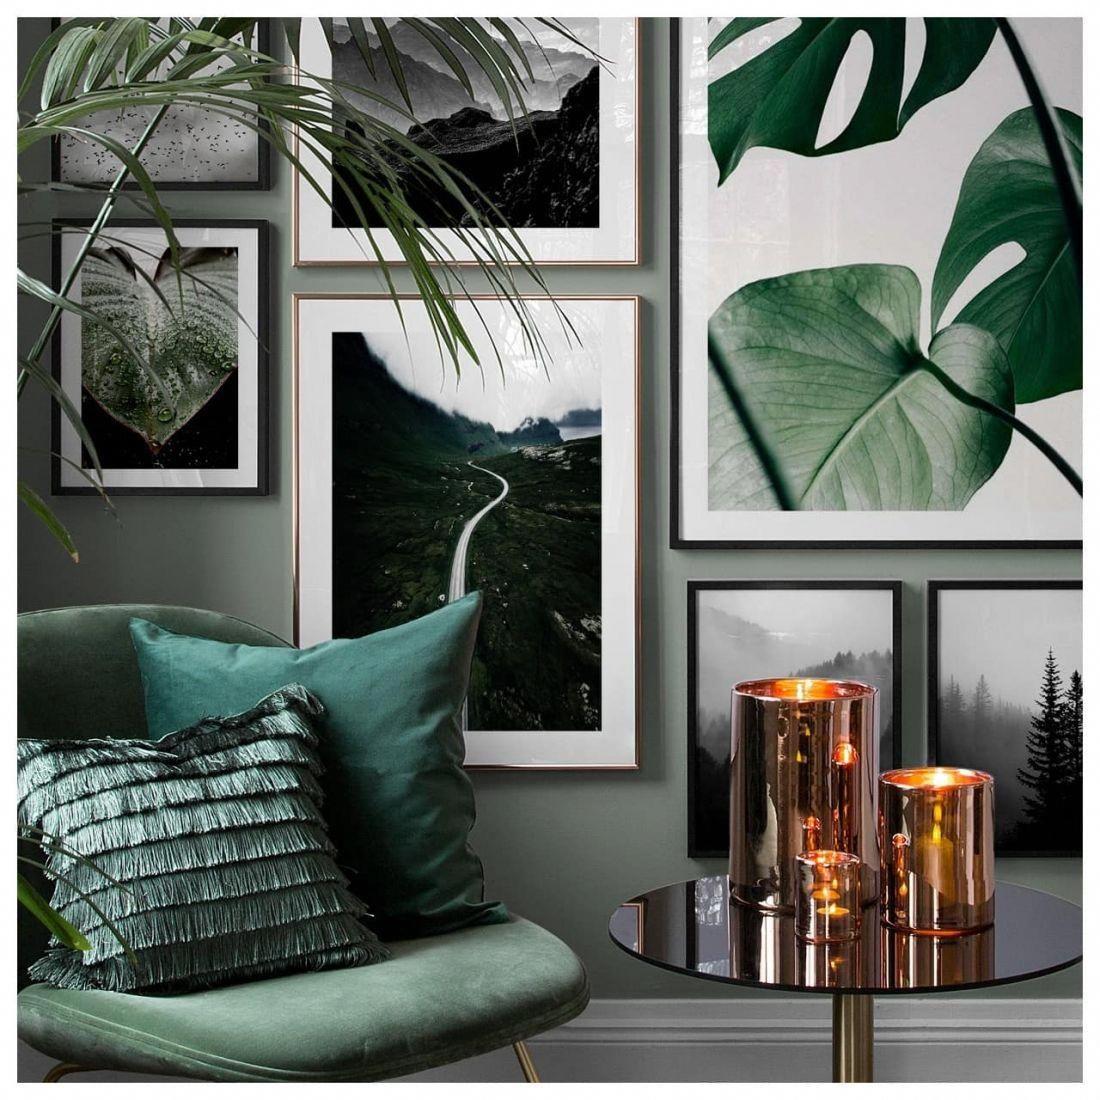 Botanical Interior Design Ideas Green And White Living Room Whitelivingroom Living Room Green Emerald Green Living Room Minimalist Living Room Decor